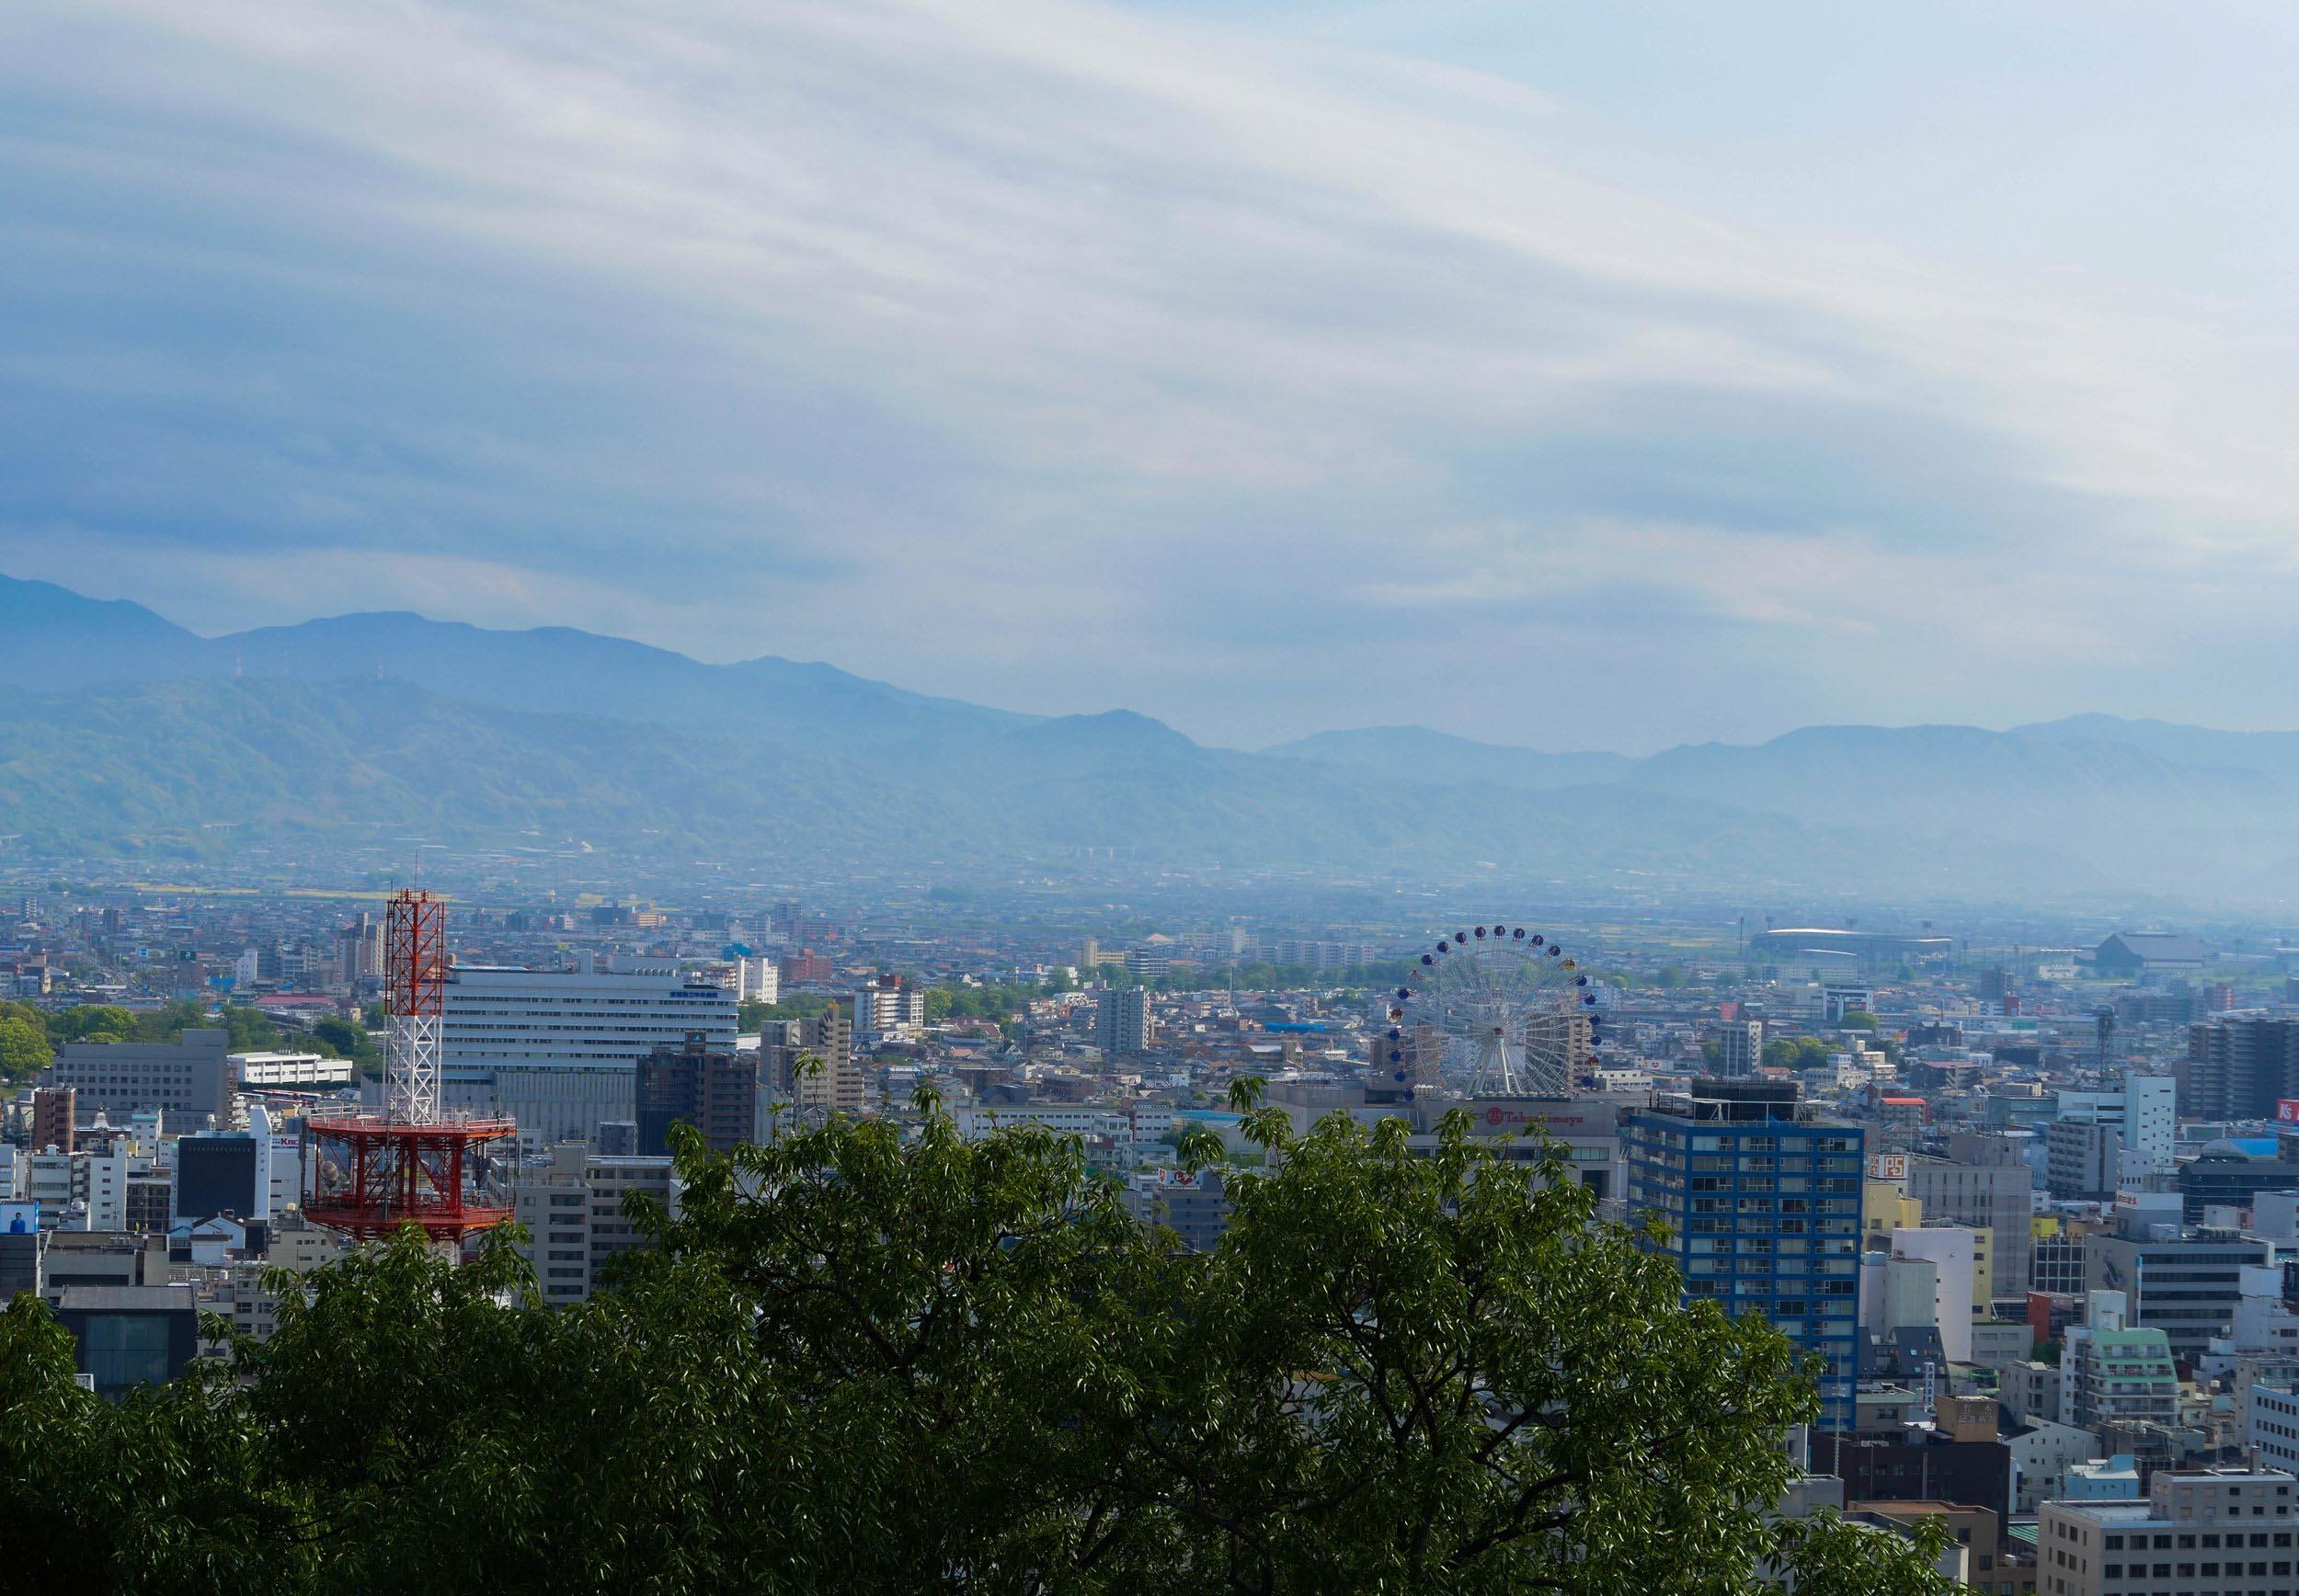 matsuyama-dougo-onsen-12.jpg